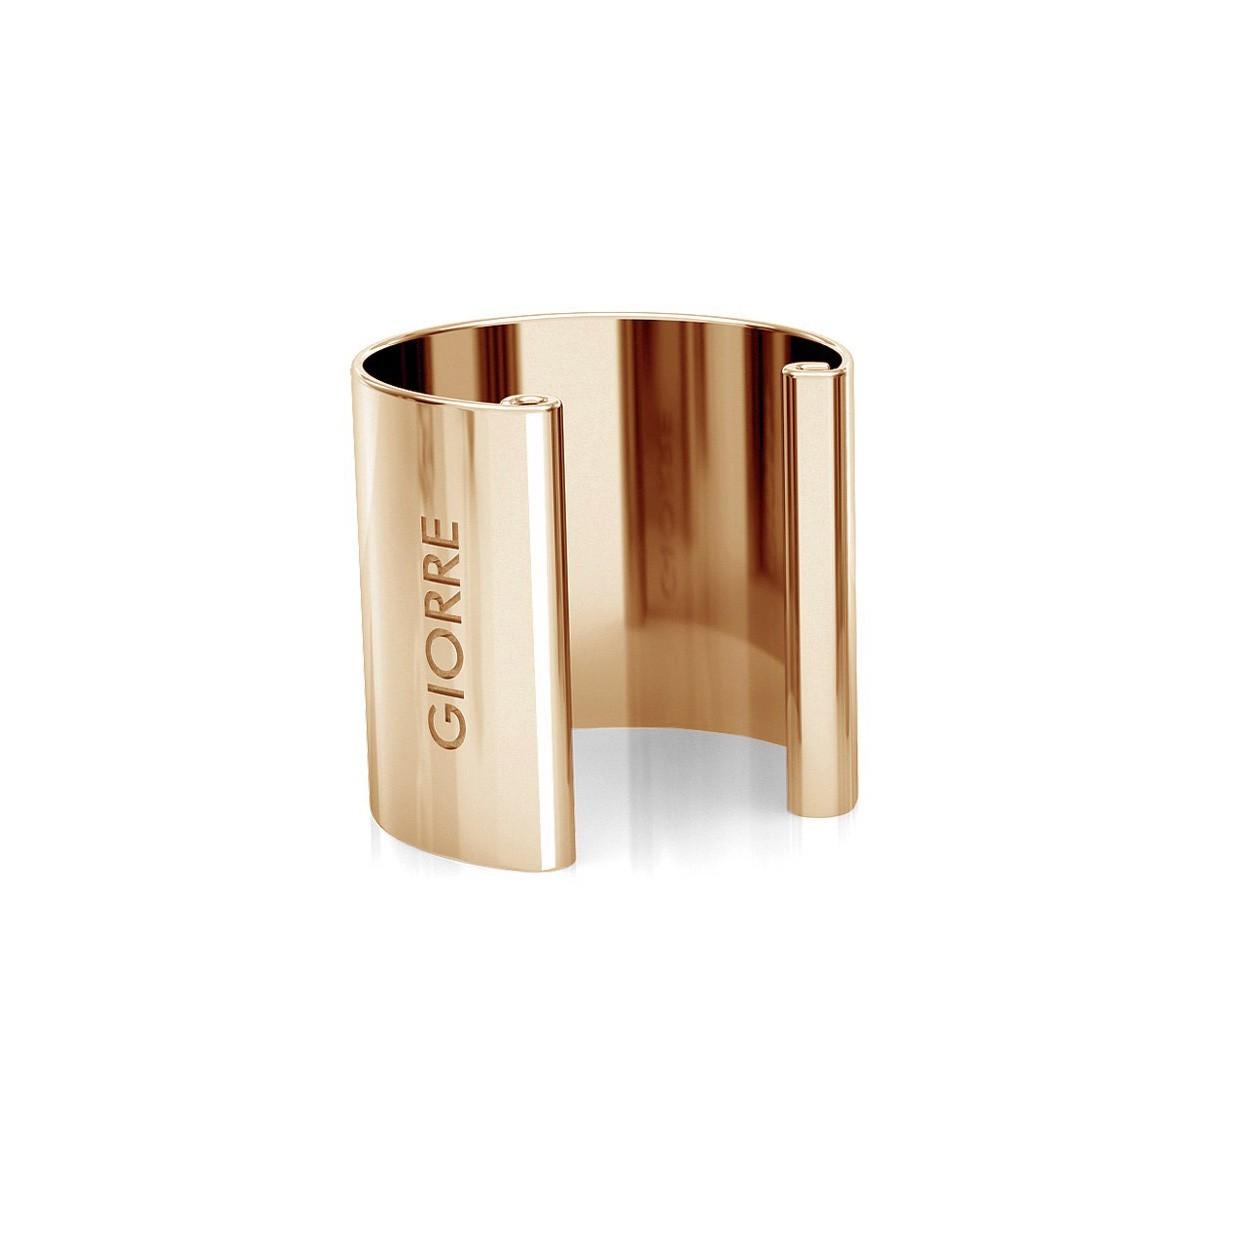 Chain earrings cone sterling silver 925